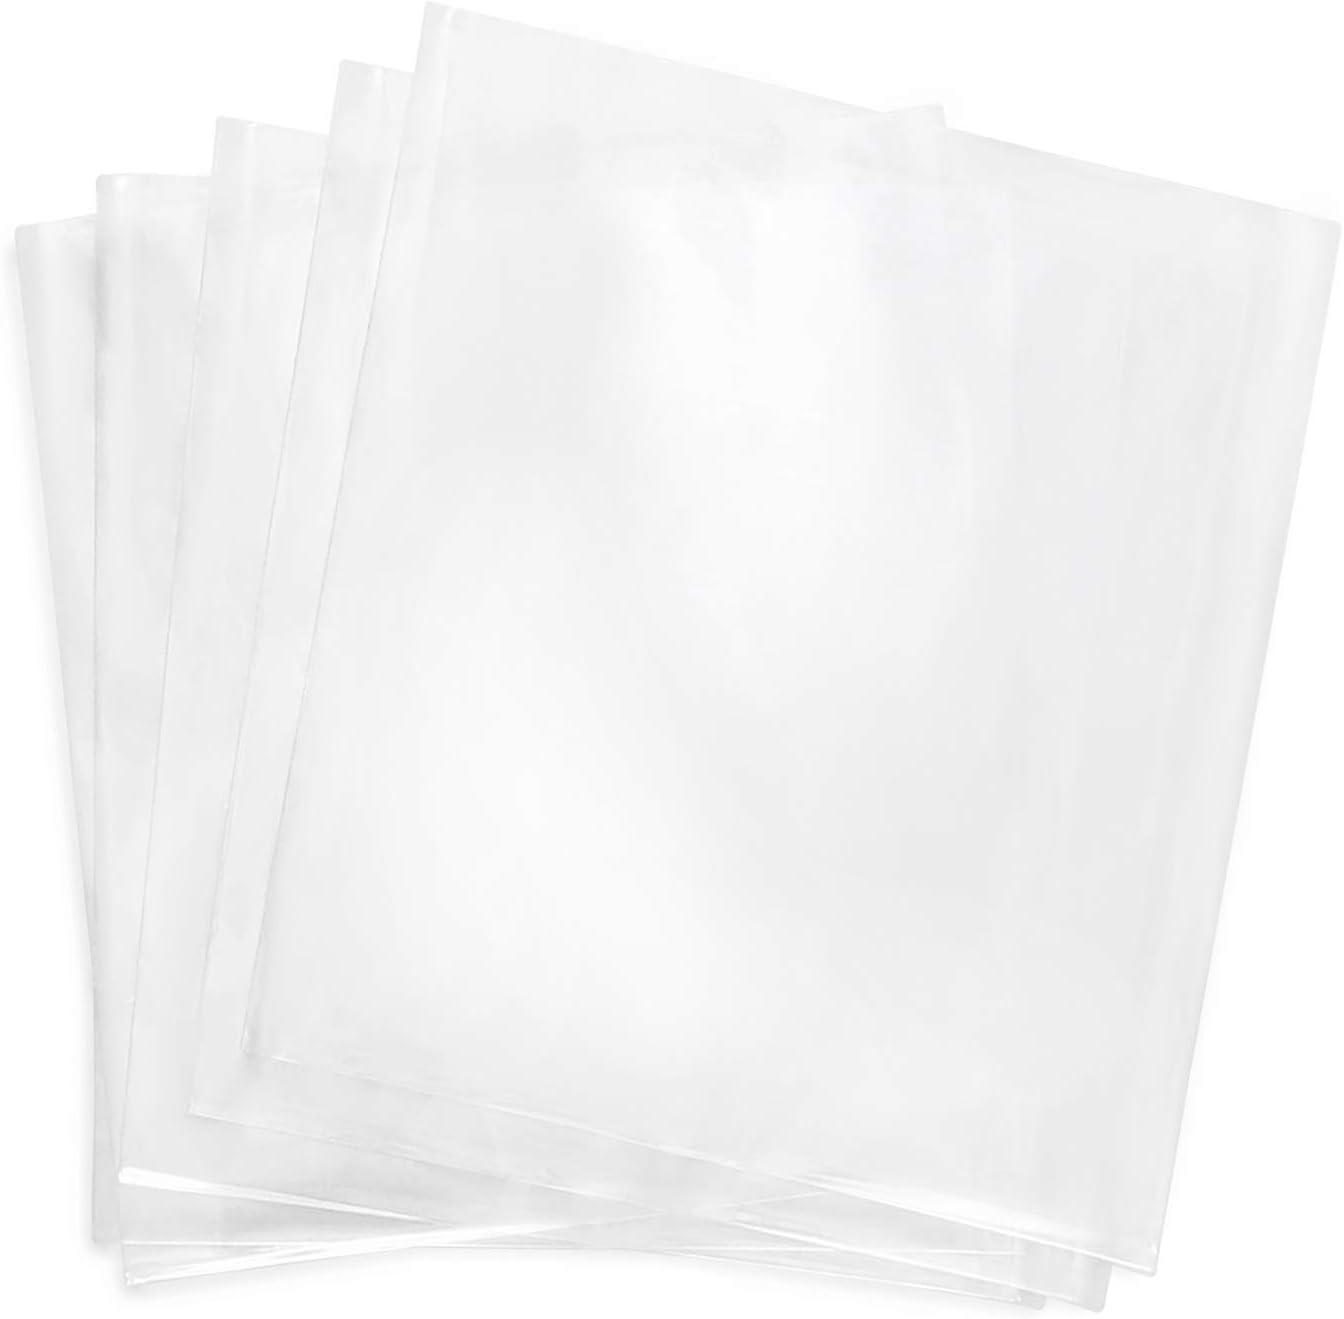 Shrink Wrap Bags,100 Pcs 7x8 Inches Clear PVC Heat Shrink Wrap f